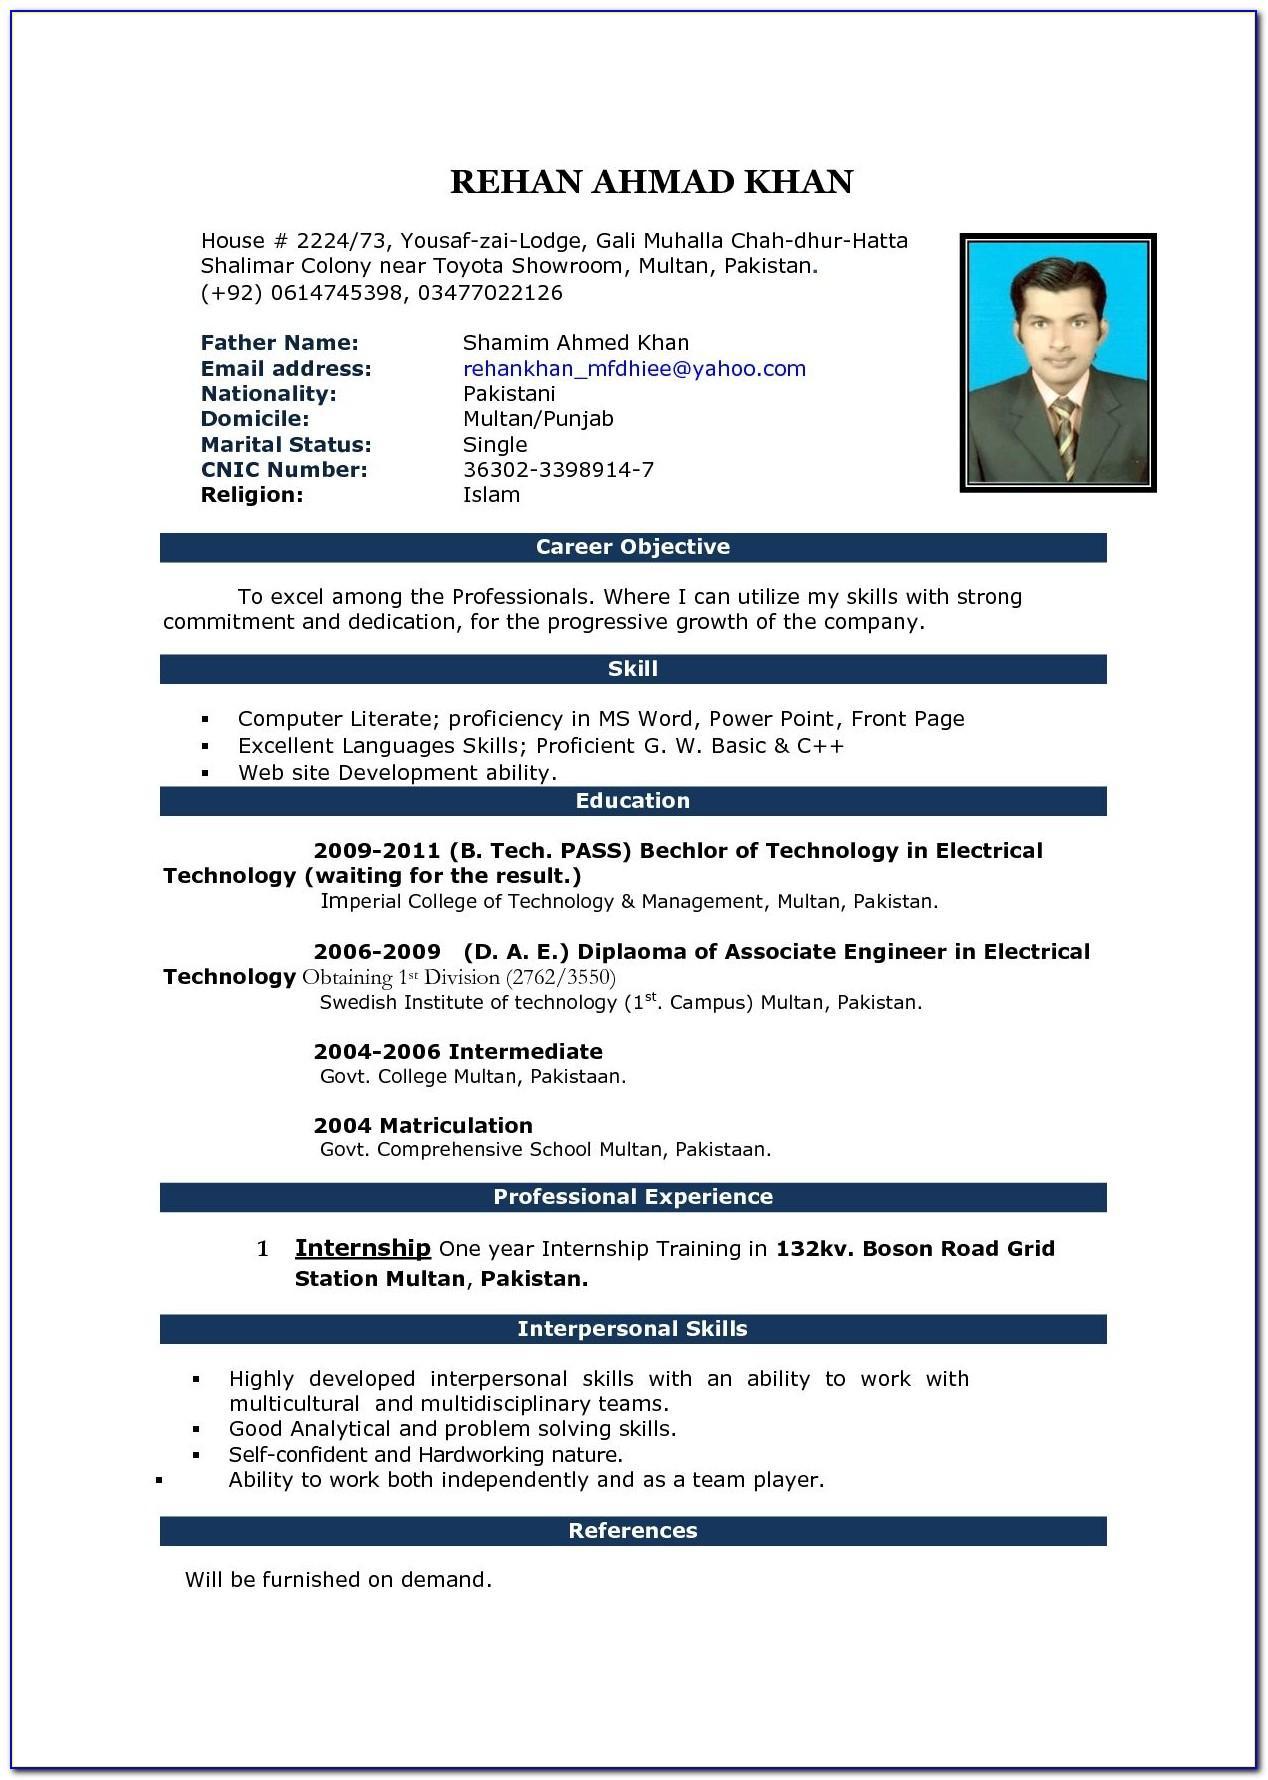 Resume Sample For Retail Sales Job